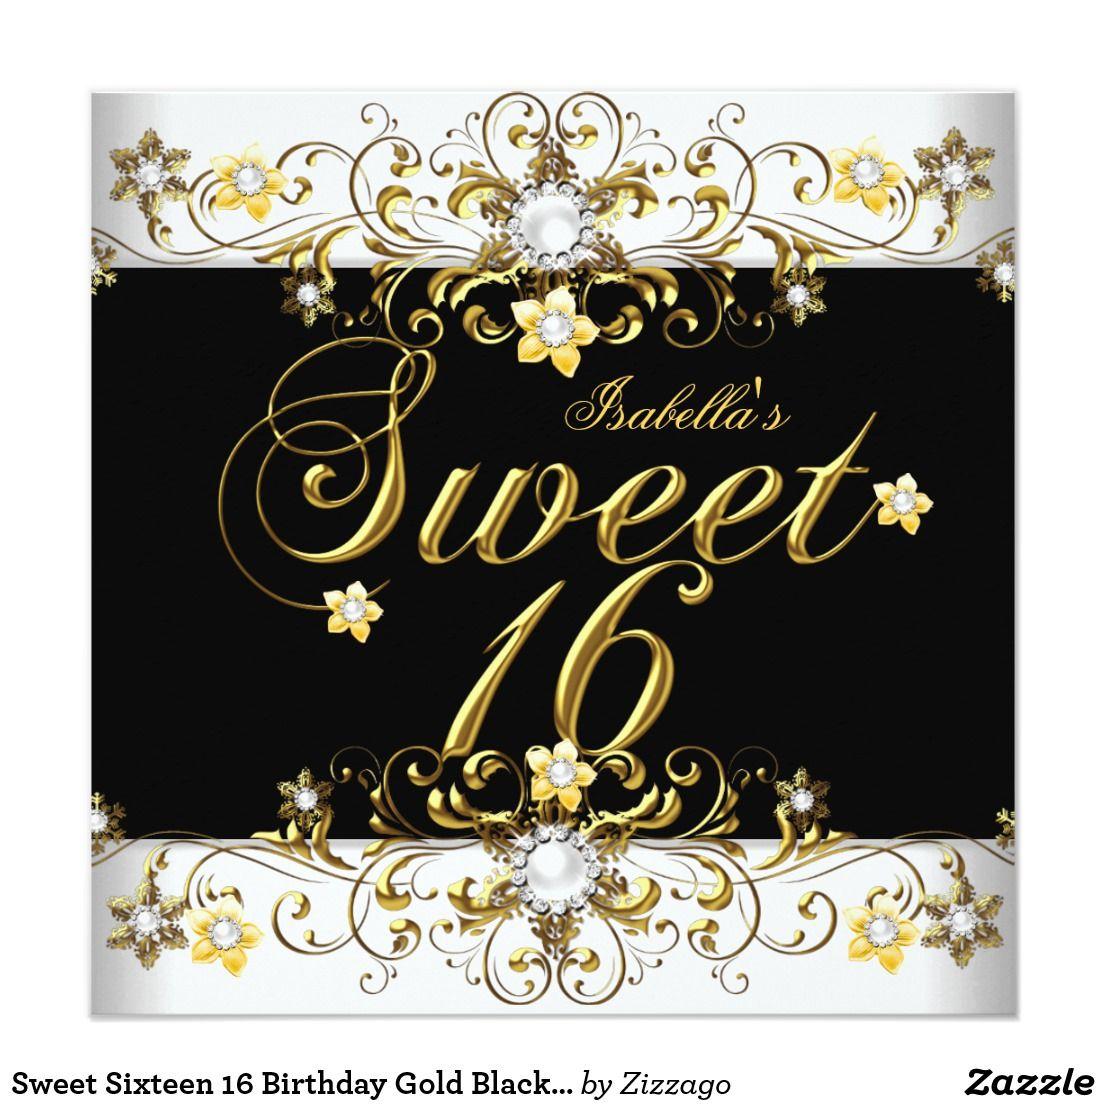 Sweet Sixteen 5 Birthday Gold Black Diamond Invitation  Zazzle